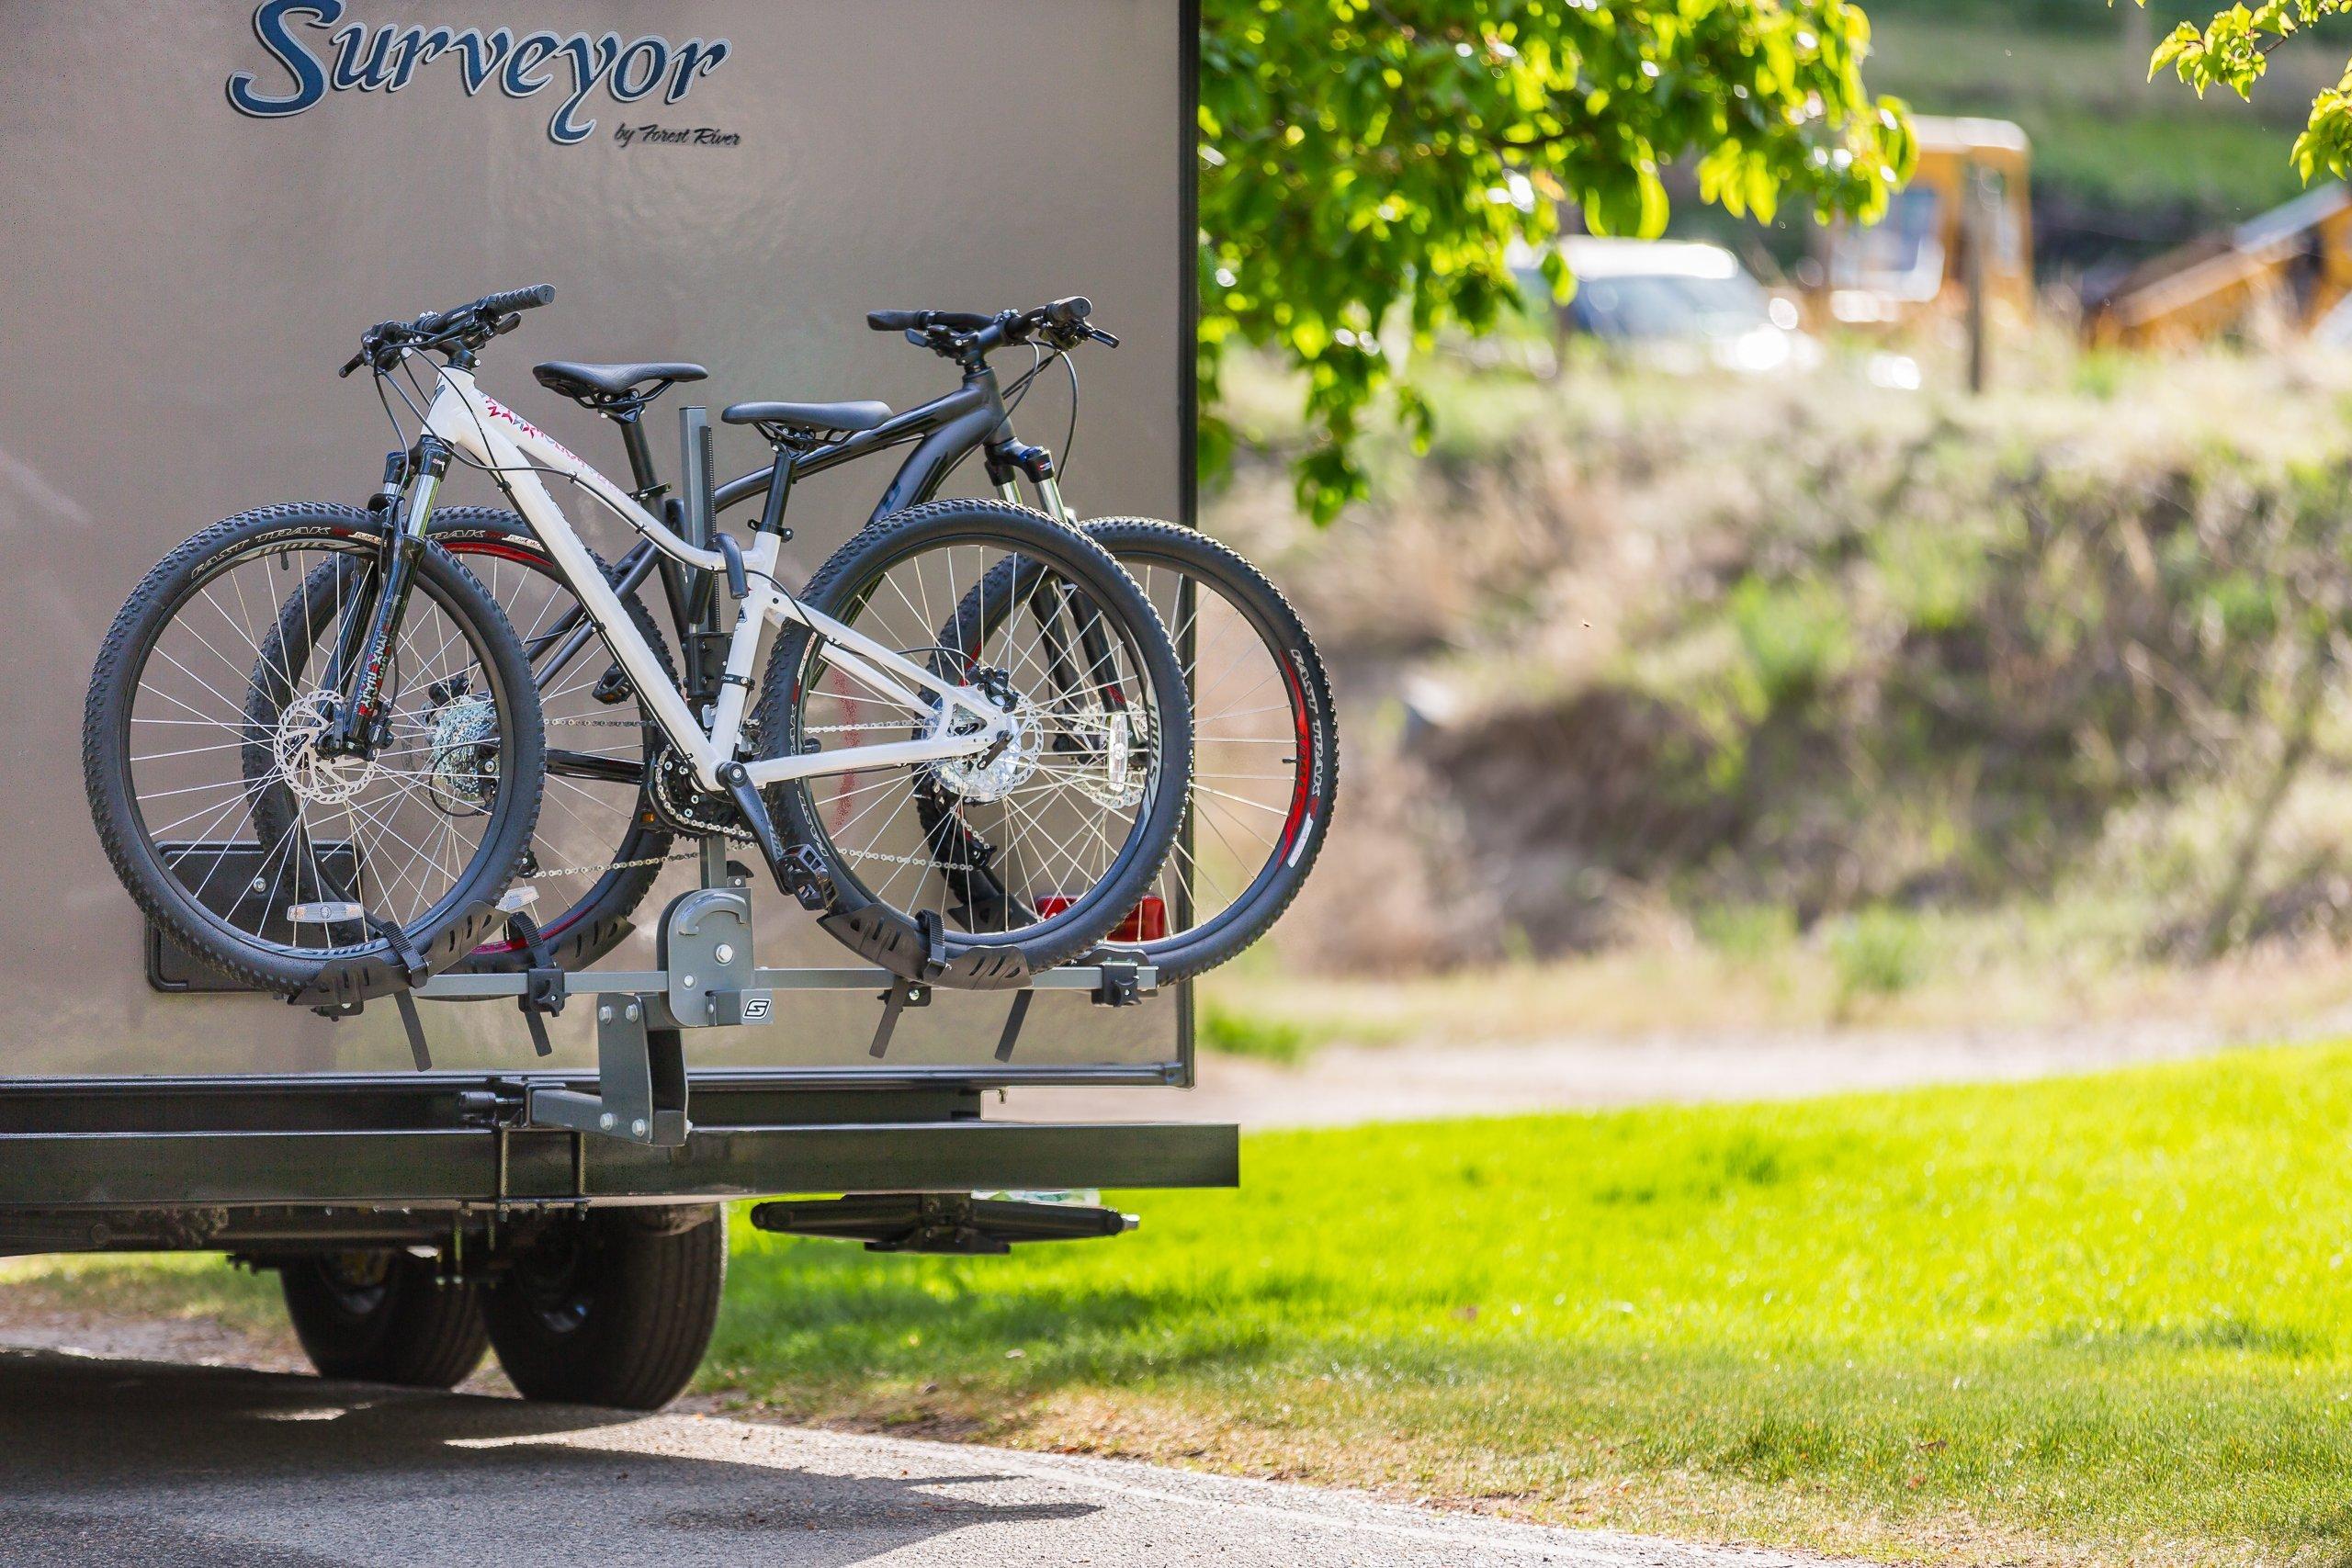 Swagman Bicycle Carriers Non-Folding Bike Dispatch, Grey, 2'' by Swagman Bicycle Carriers (Image #3)